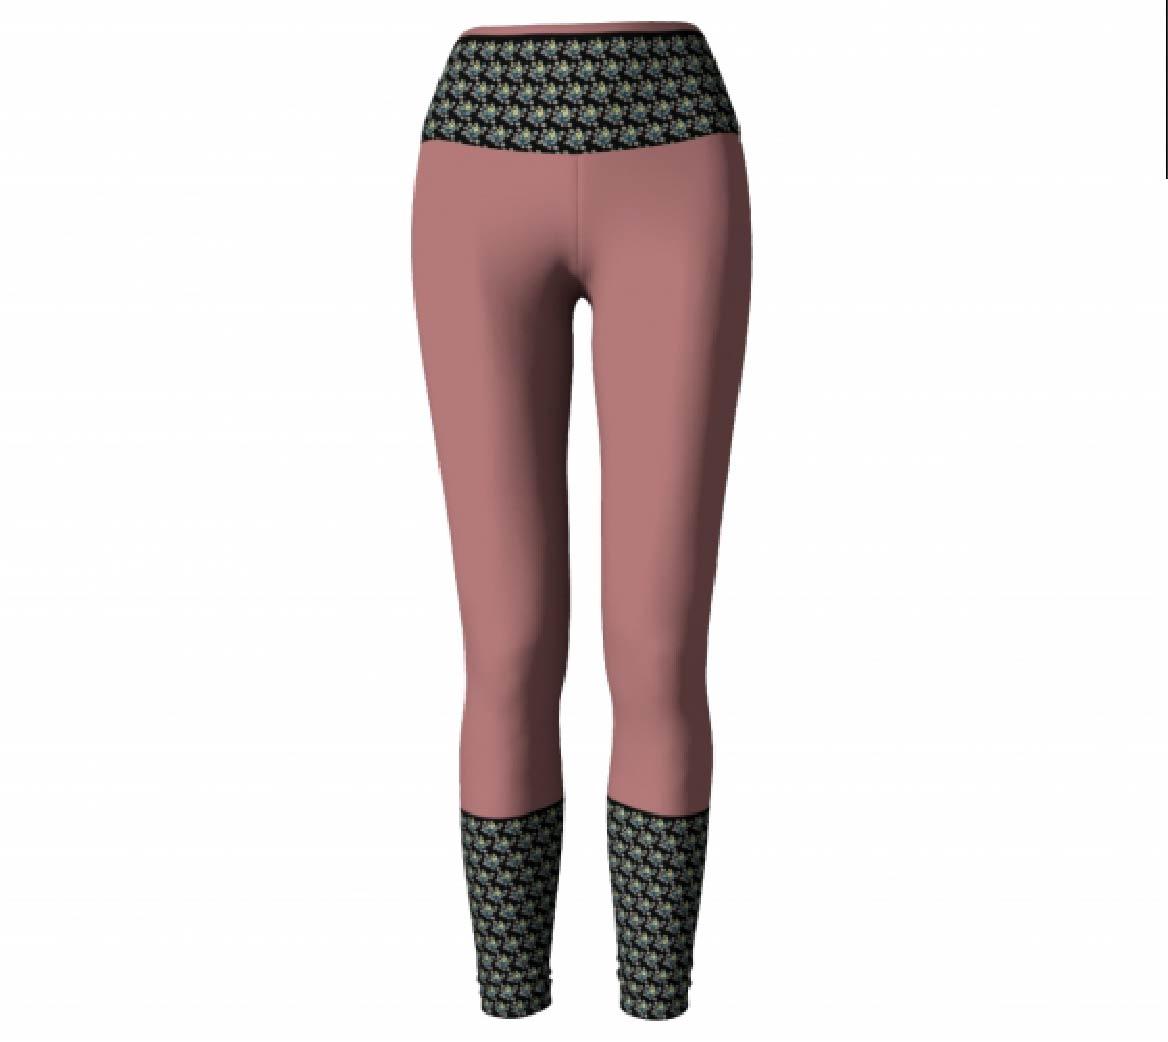 Mauve Leggings         $45